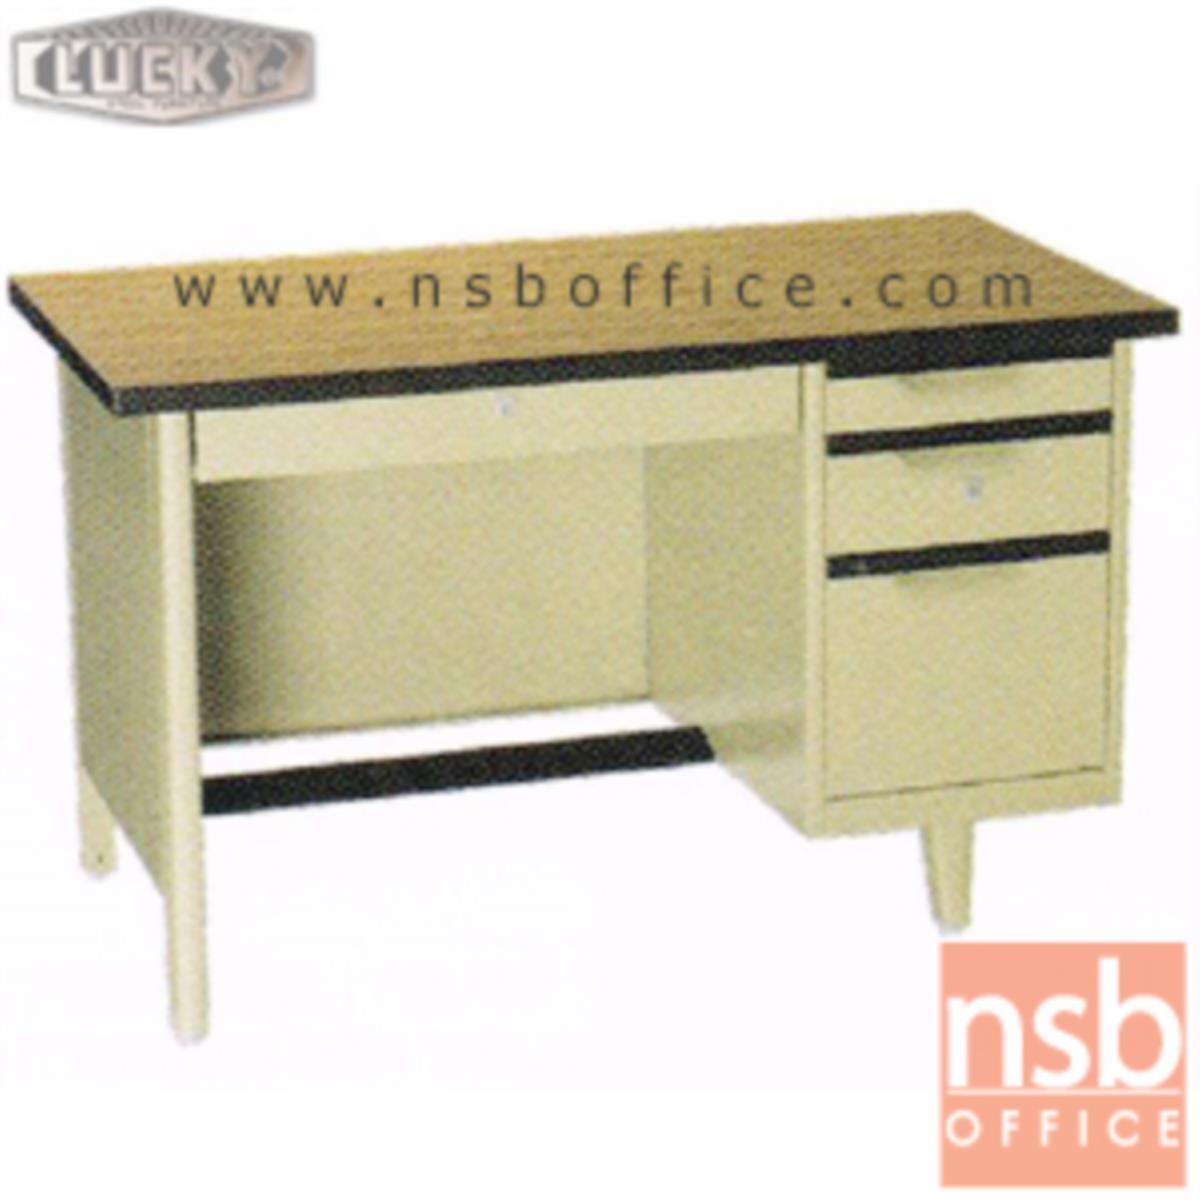 E28A106:โต๊ะทำงานเหล็กหน้าโฟเมก้าลายไม้ 4 ลิ้นชัก  รุ่น NTC-2436,NTC-2642,NTC-2648 ยี่ห้อ Lucky